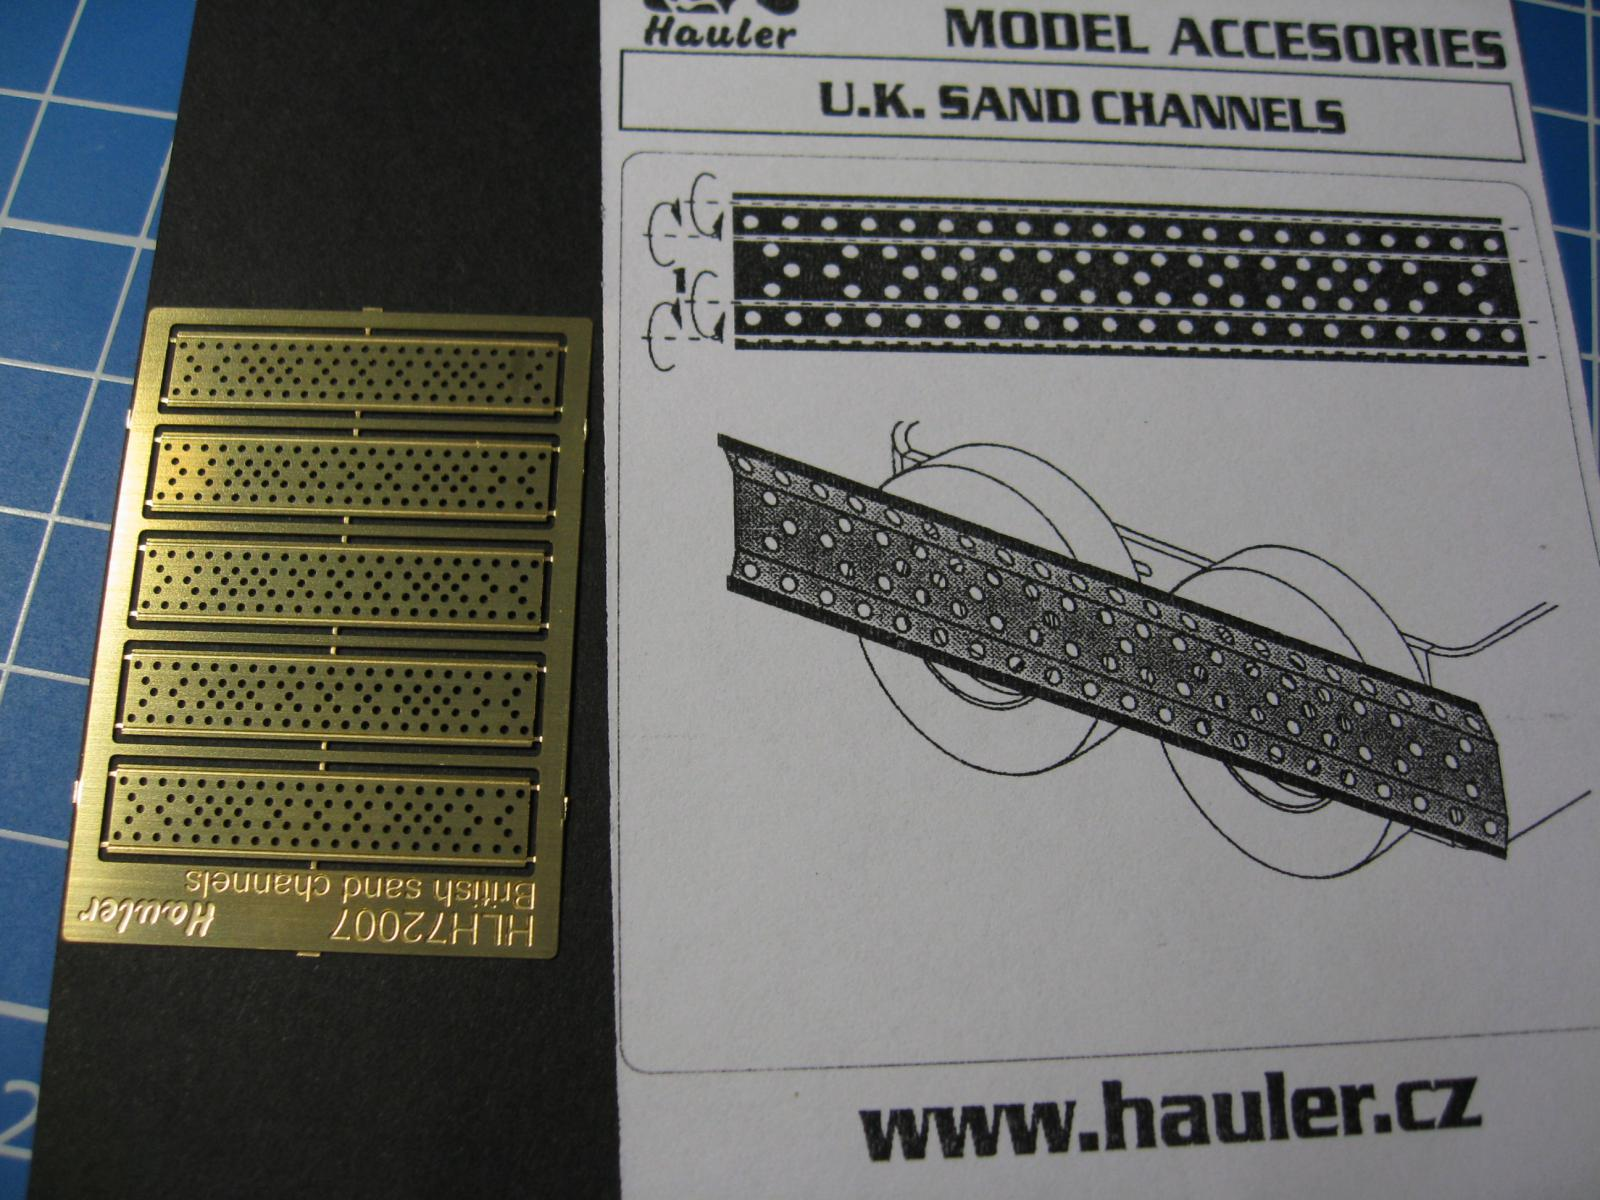 Hauler - UK. Sand Channels Kn1y-bt-6680